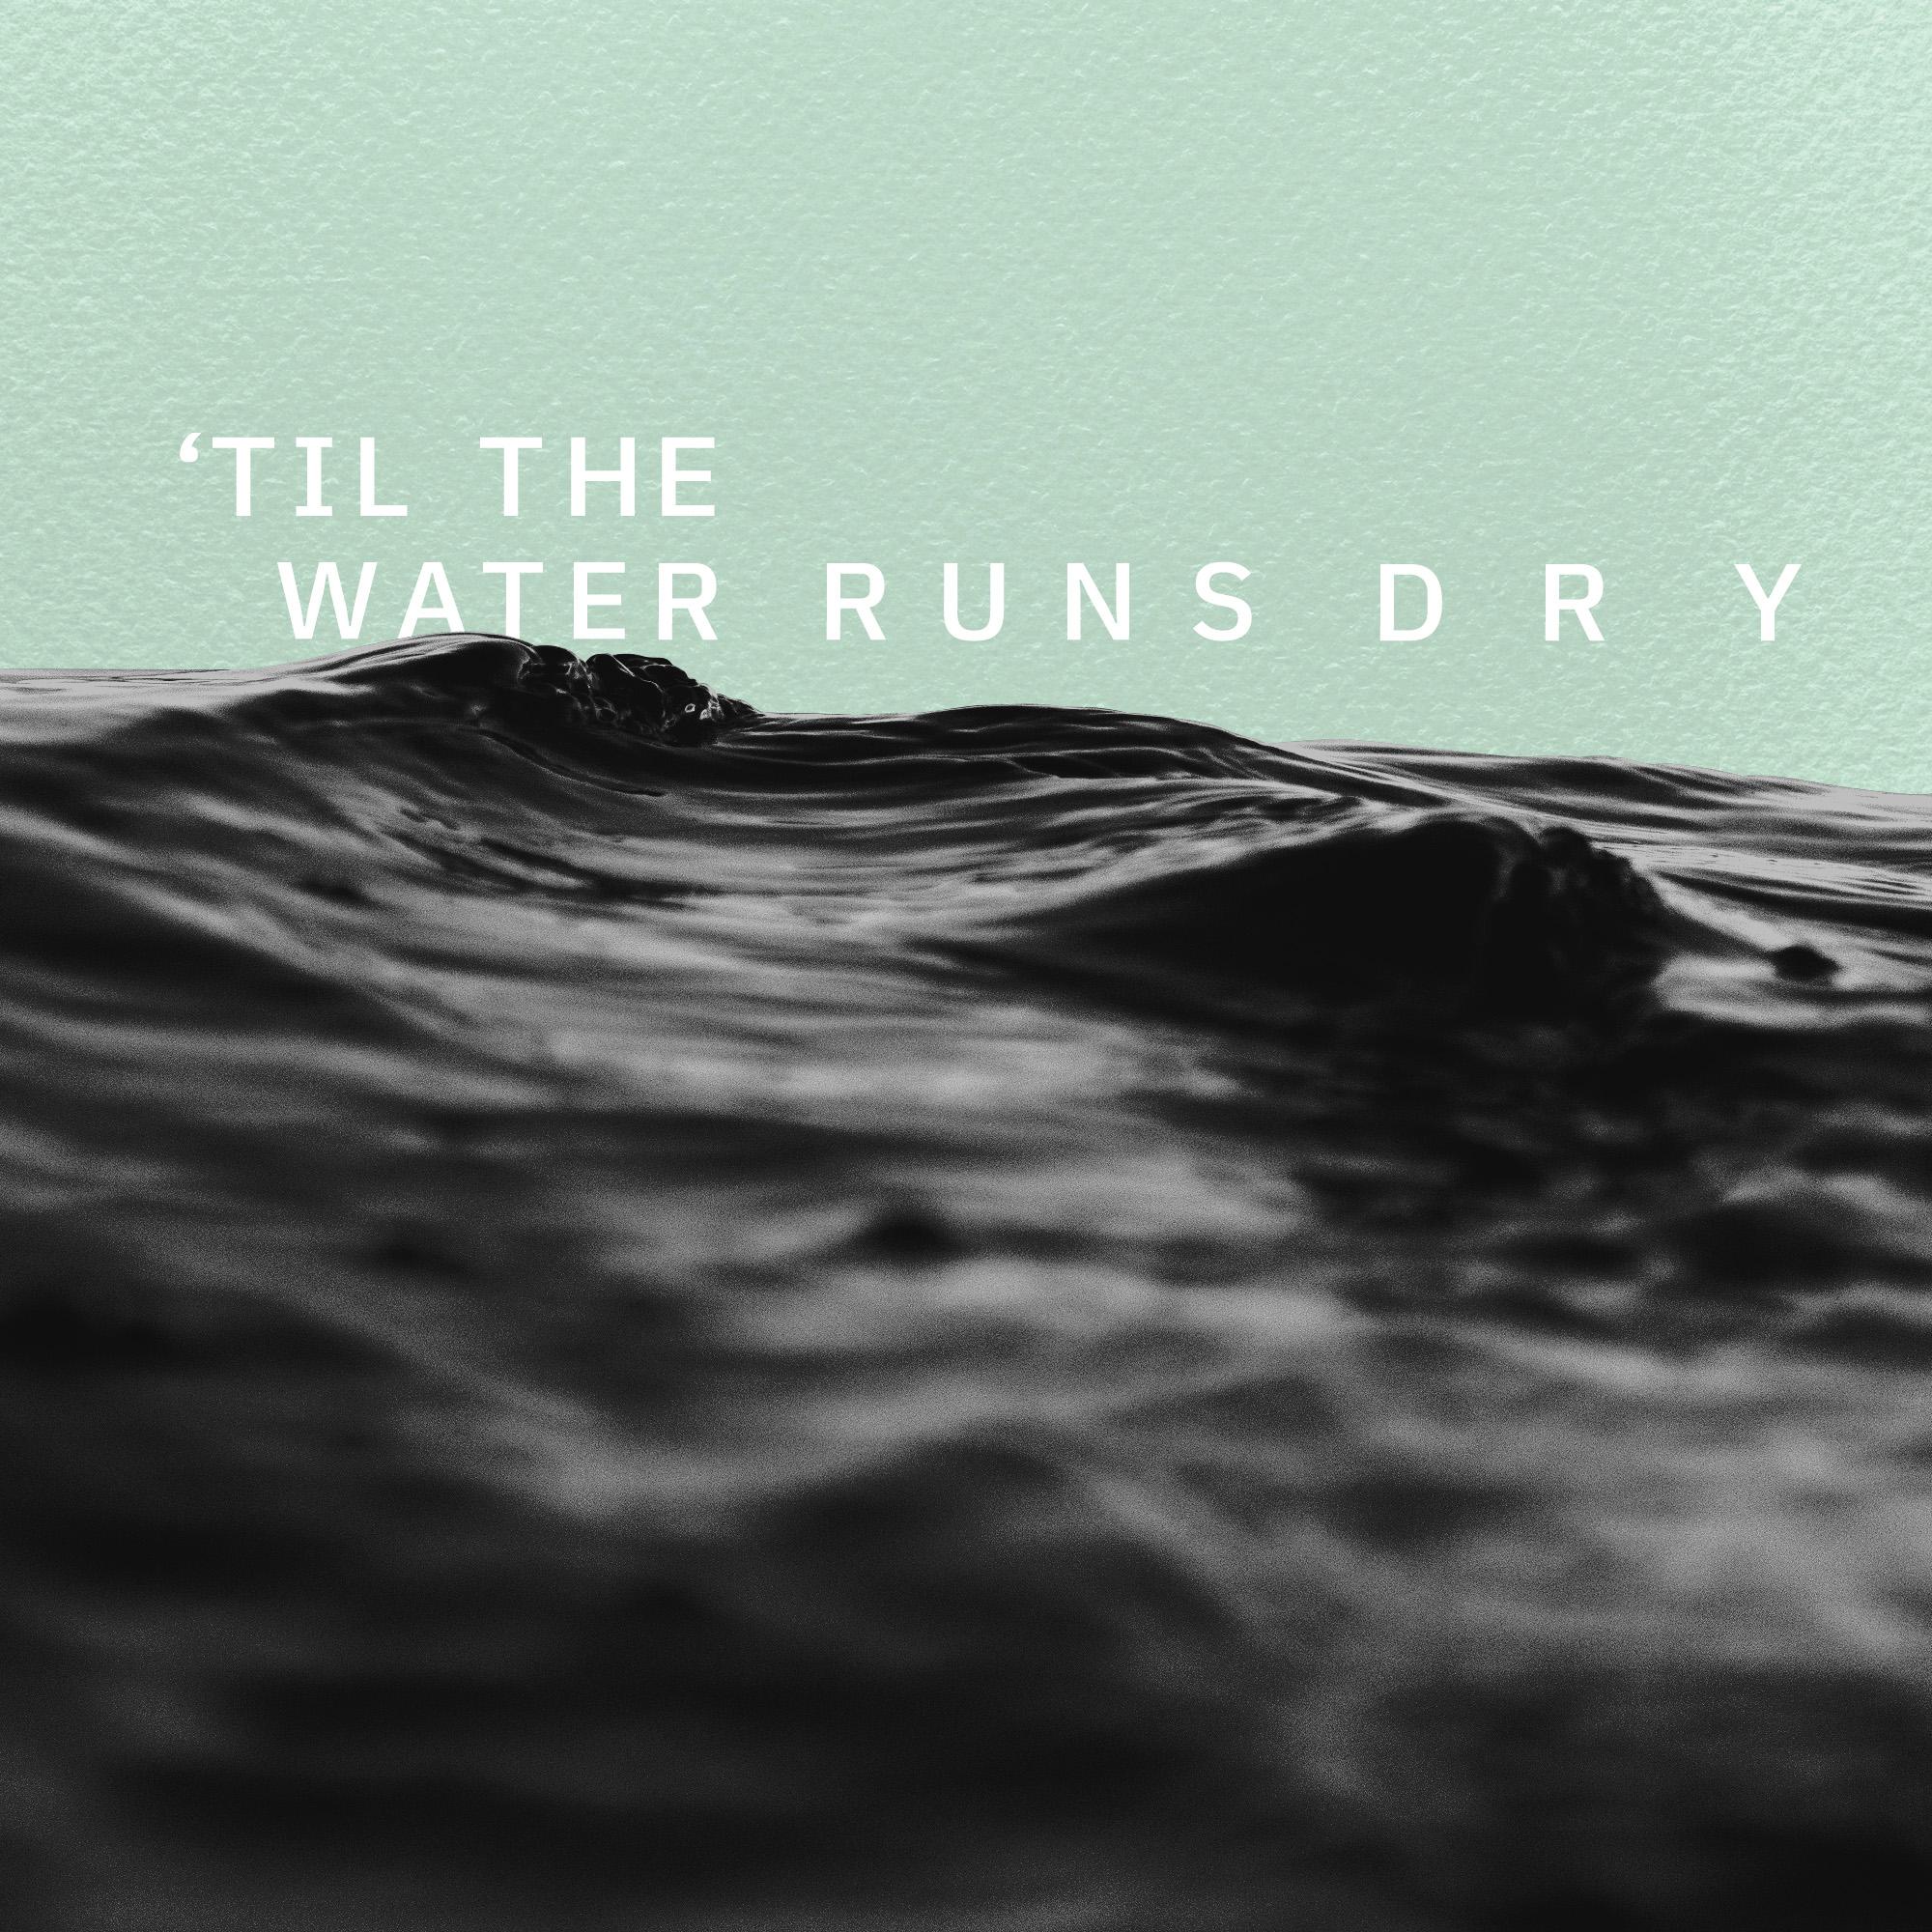 'til the Water Runs Dry - Craig Haller